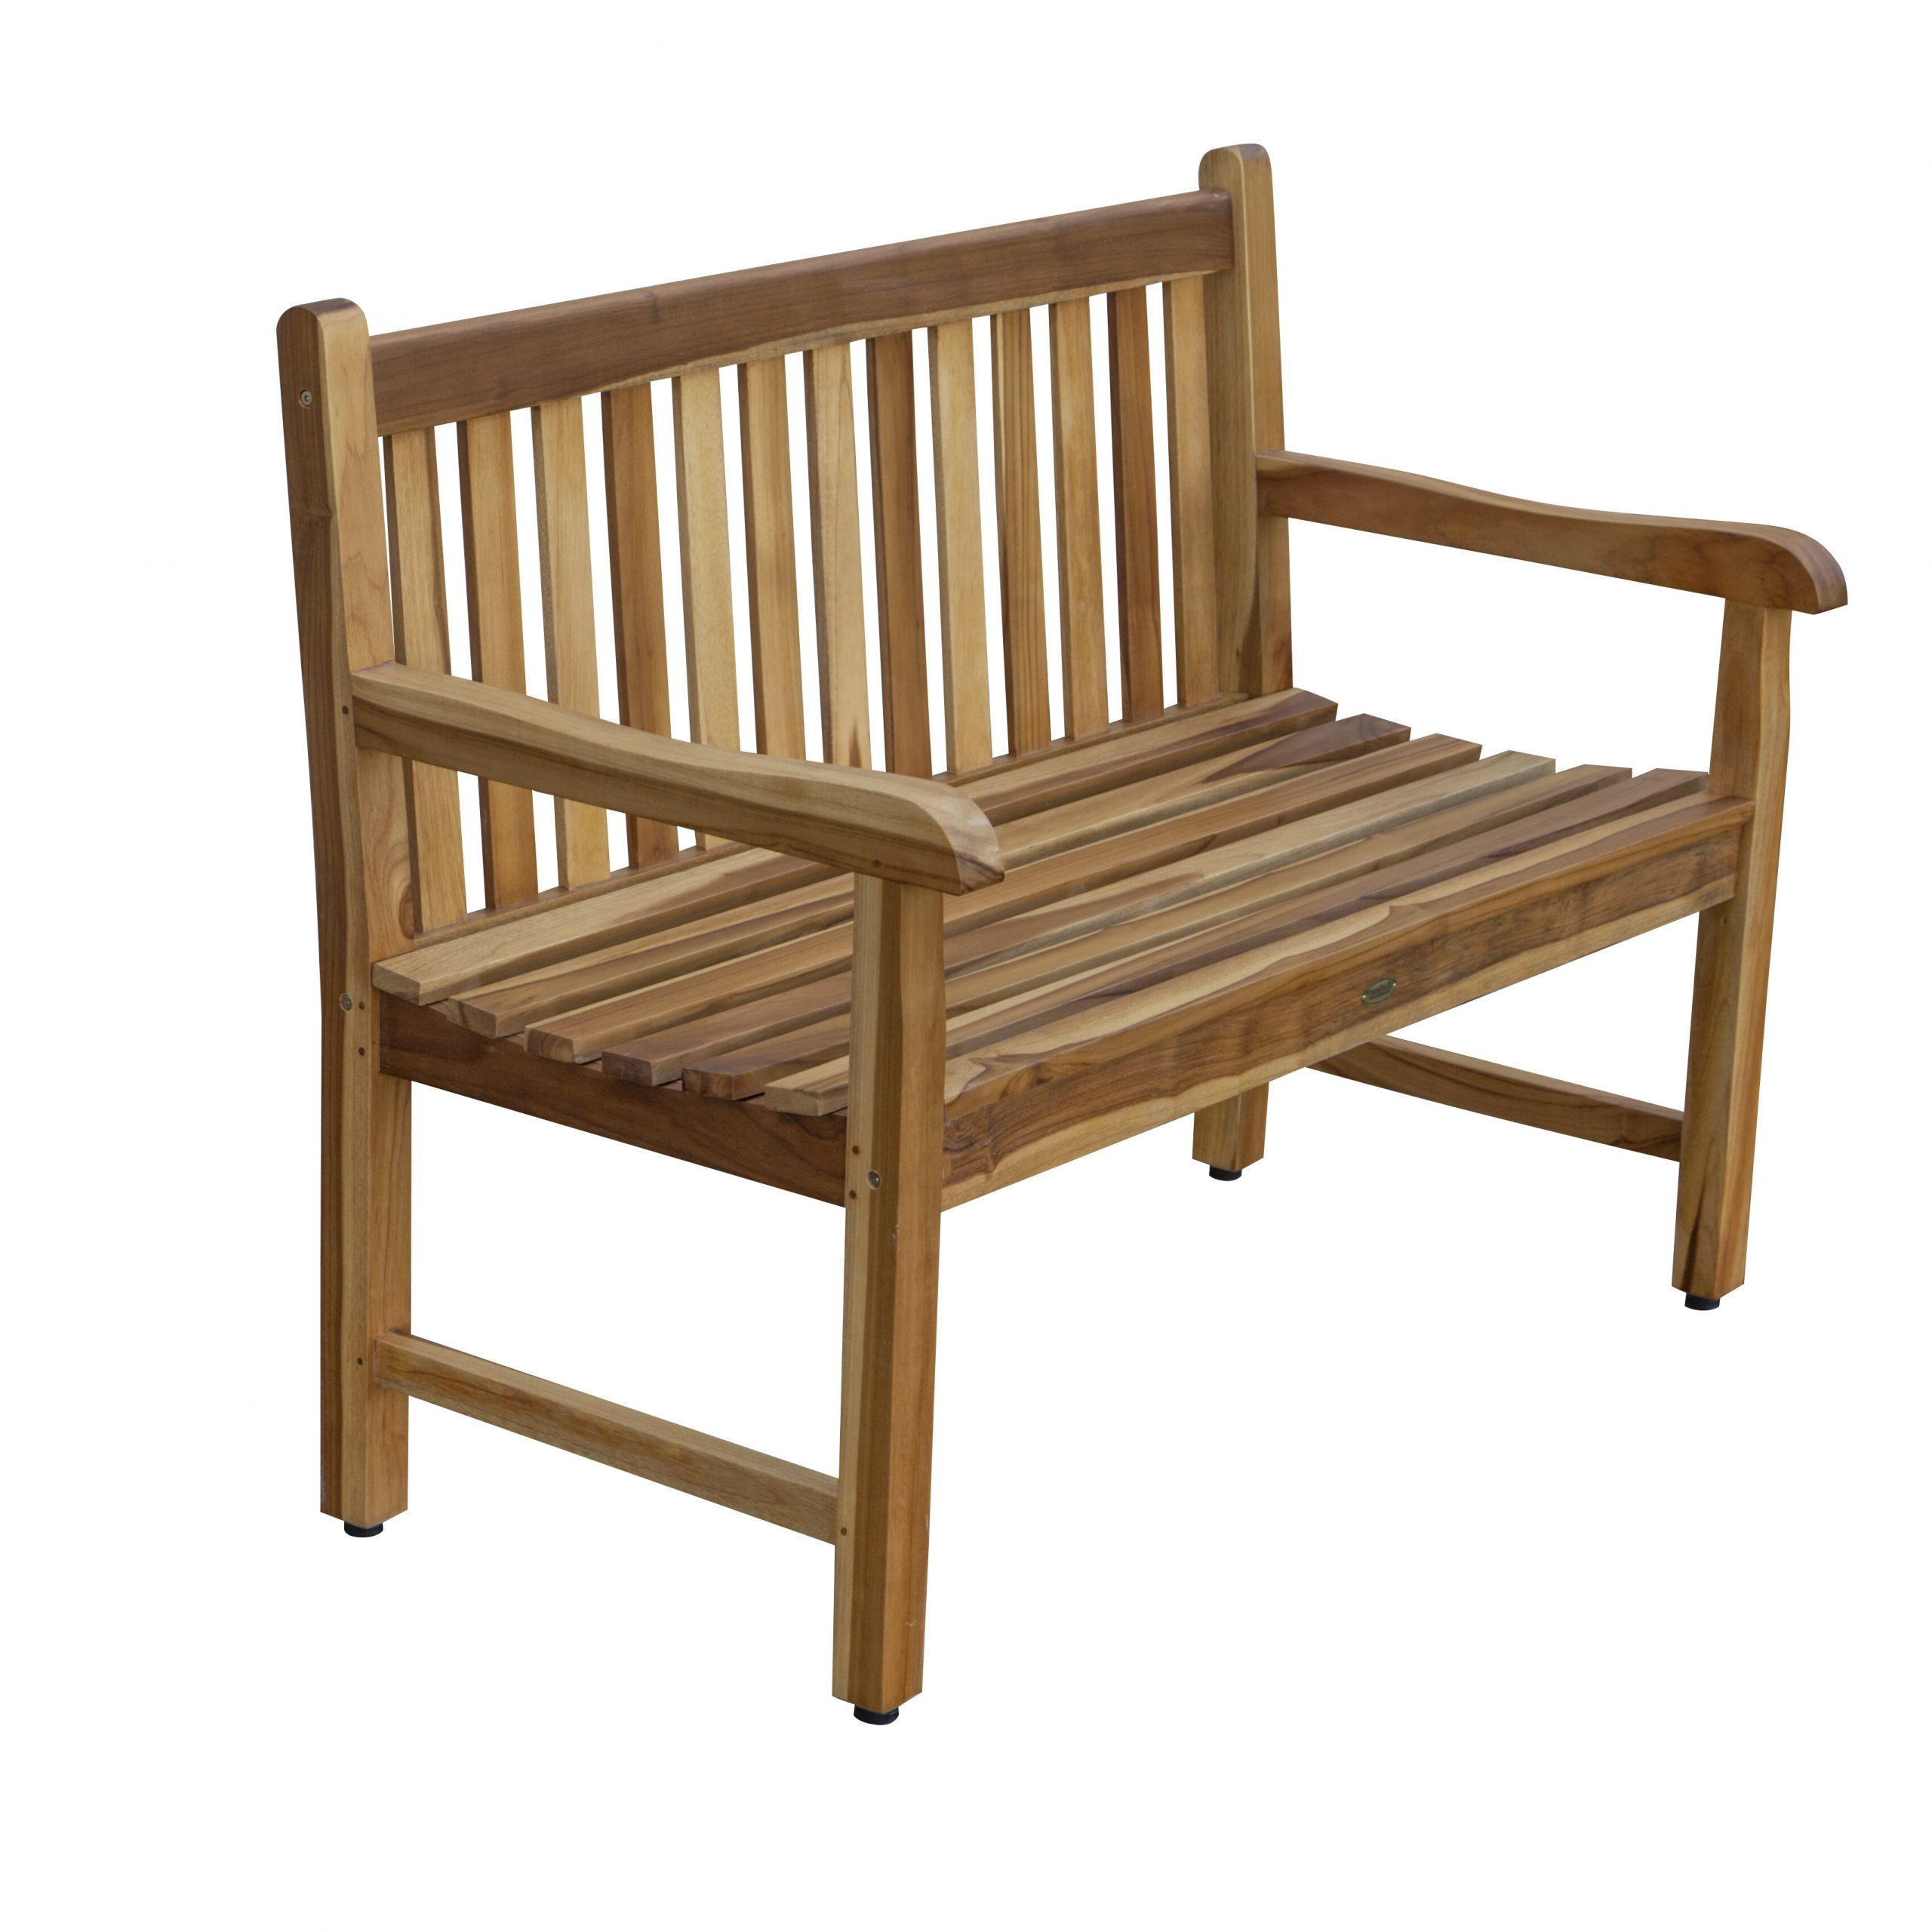 Current Hampstead Heath Teak Garden Bench For Harpersfield Wooden Garden Benches (View 7 of 30)